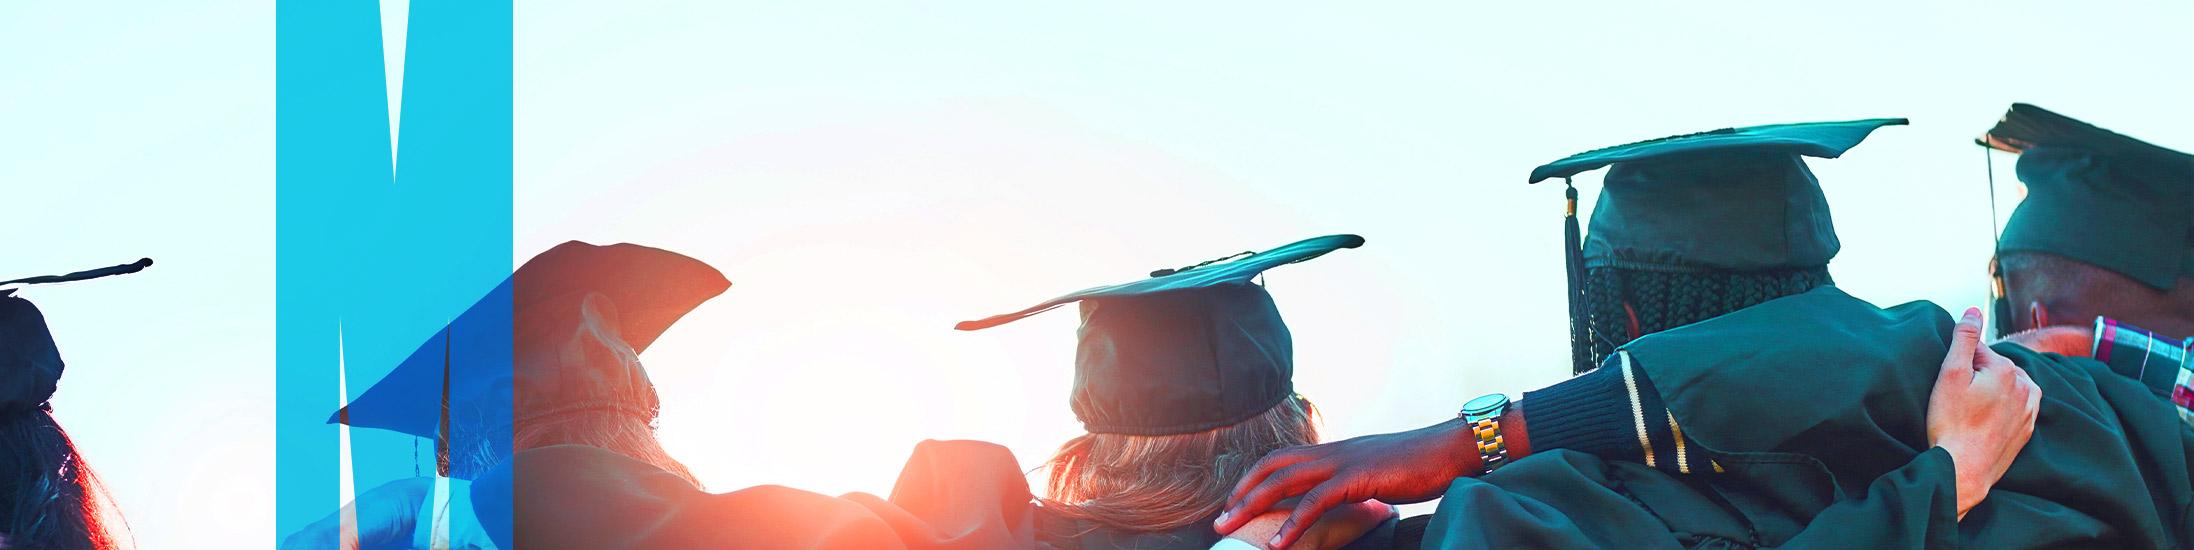 2021 Graduation Gifts